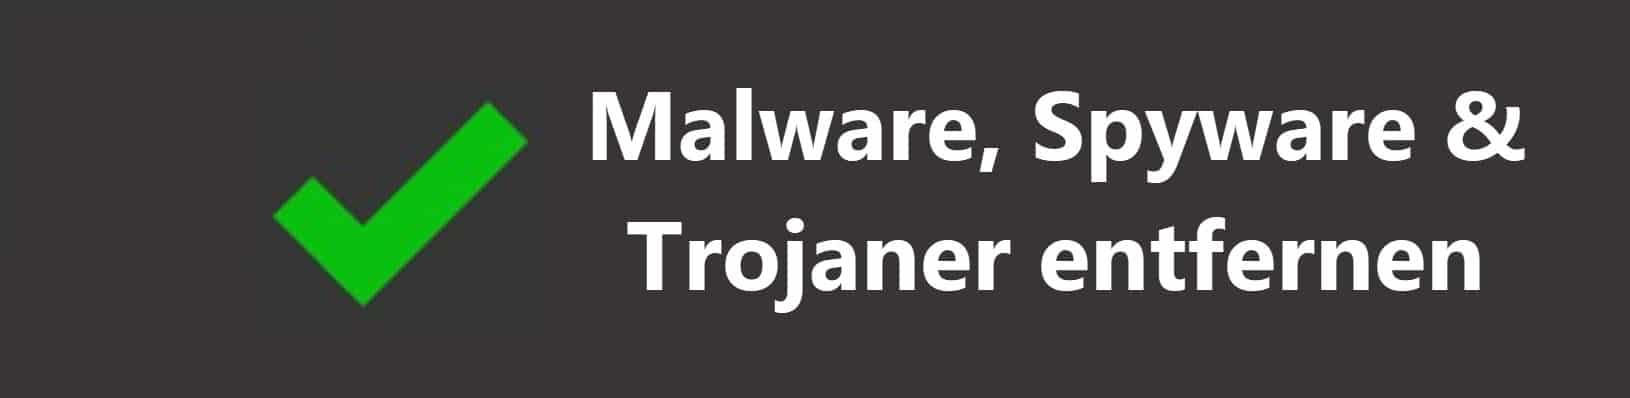 Malware, Spyware & Trojaner entfernen